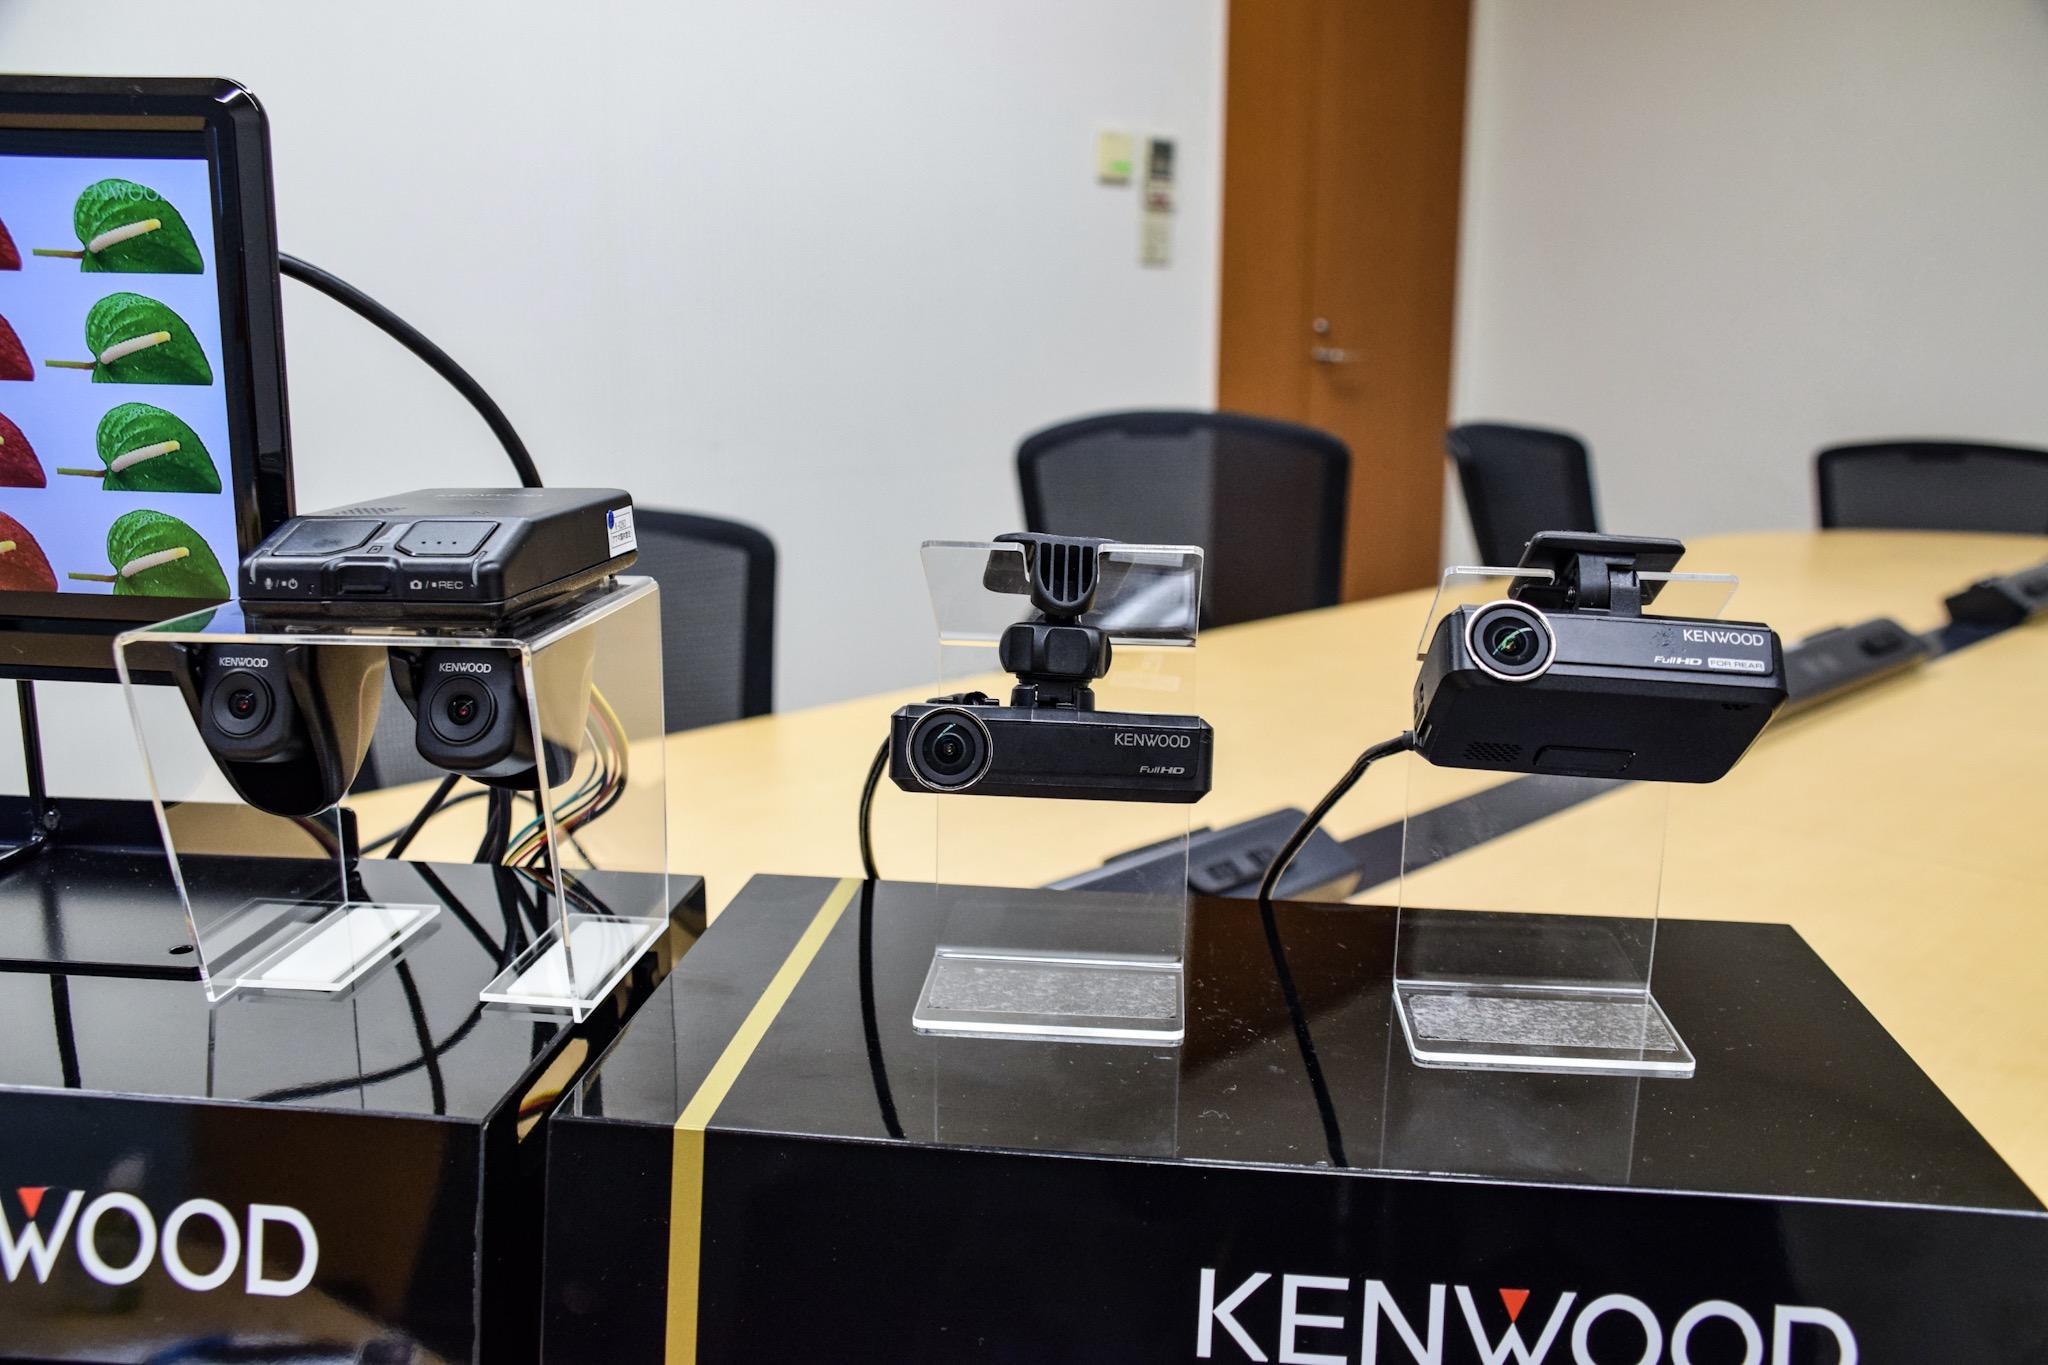 KENWOOD DVR-MN940